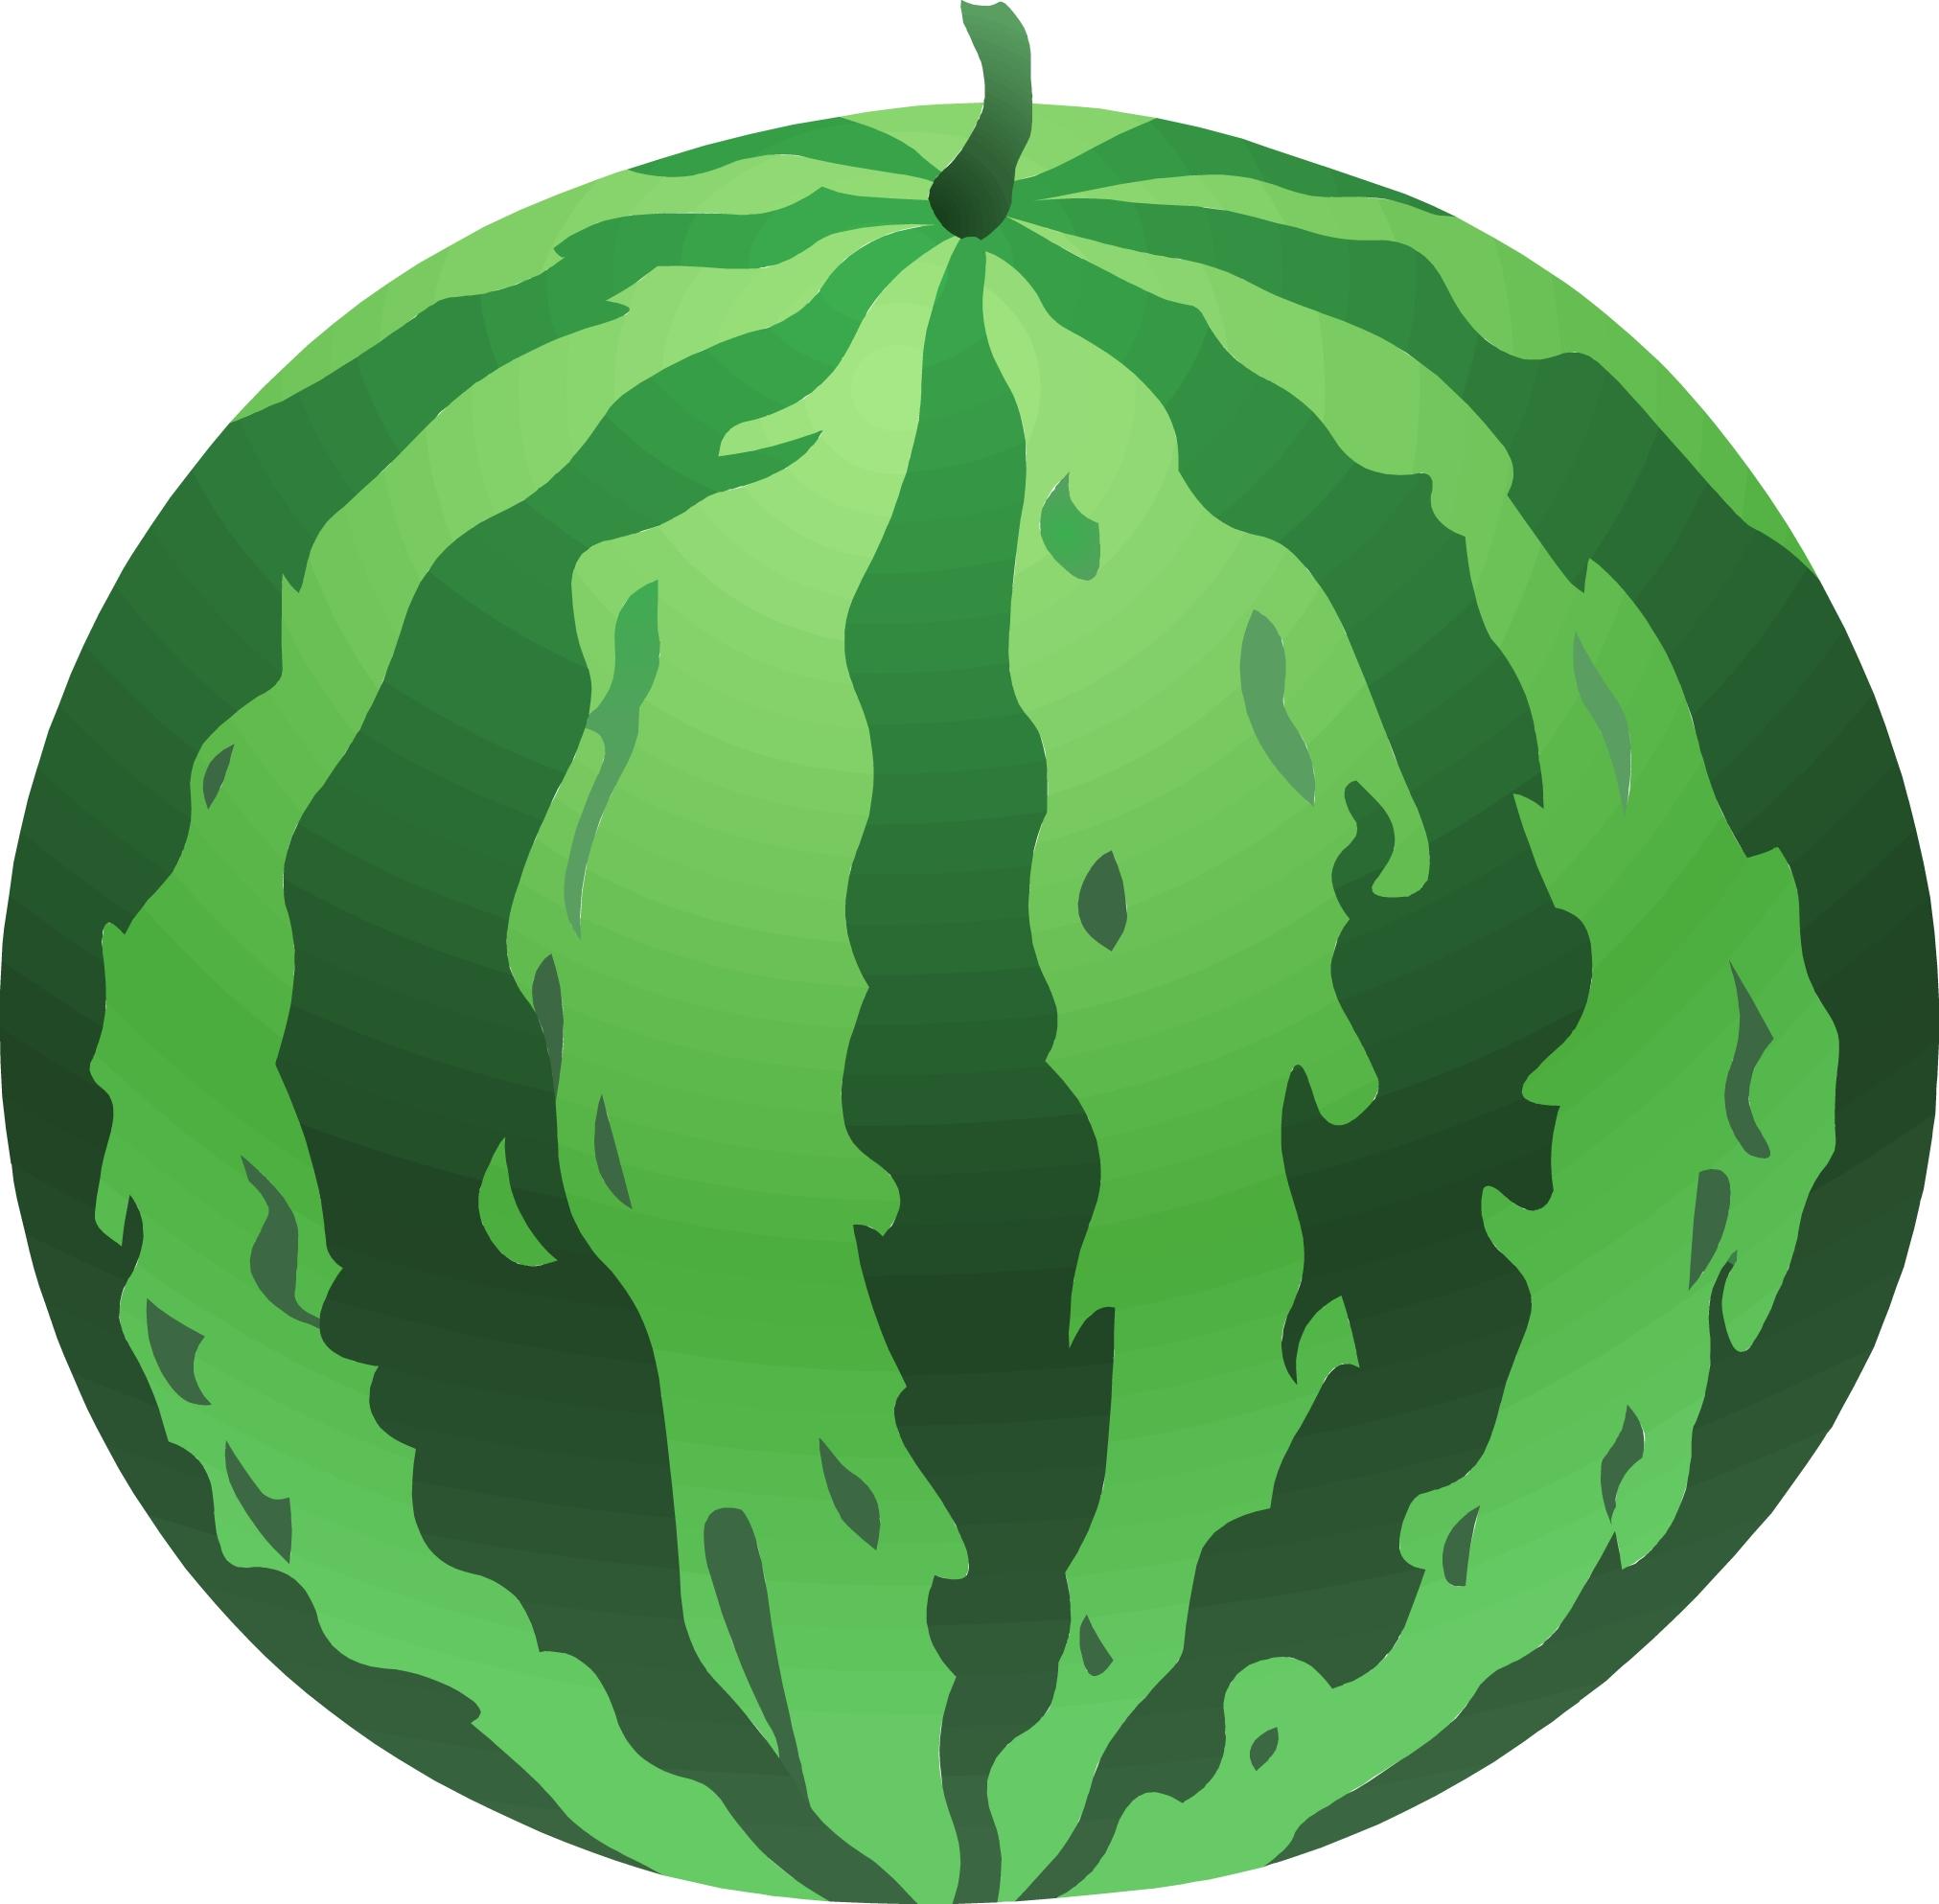 Melon clipart watermelon fruit Zone Cliparts Clipart Fruit Watermelon